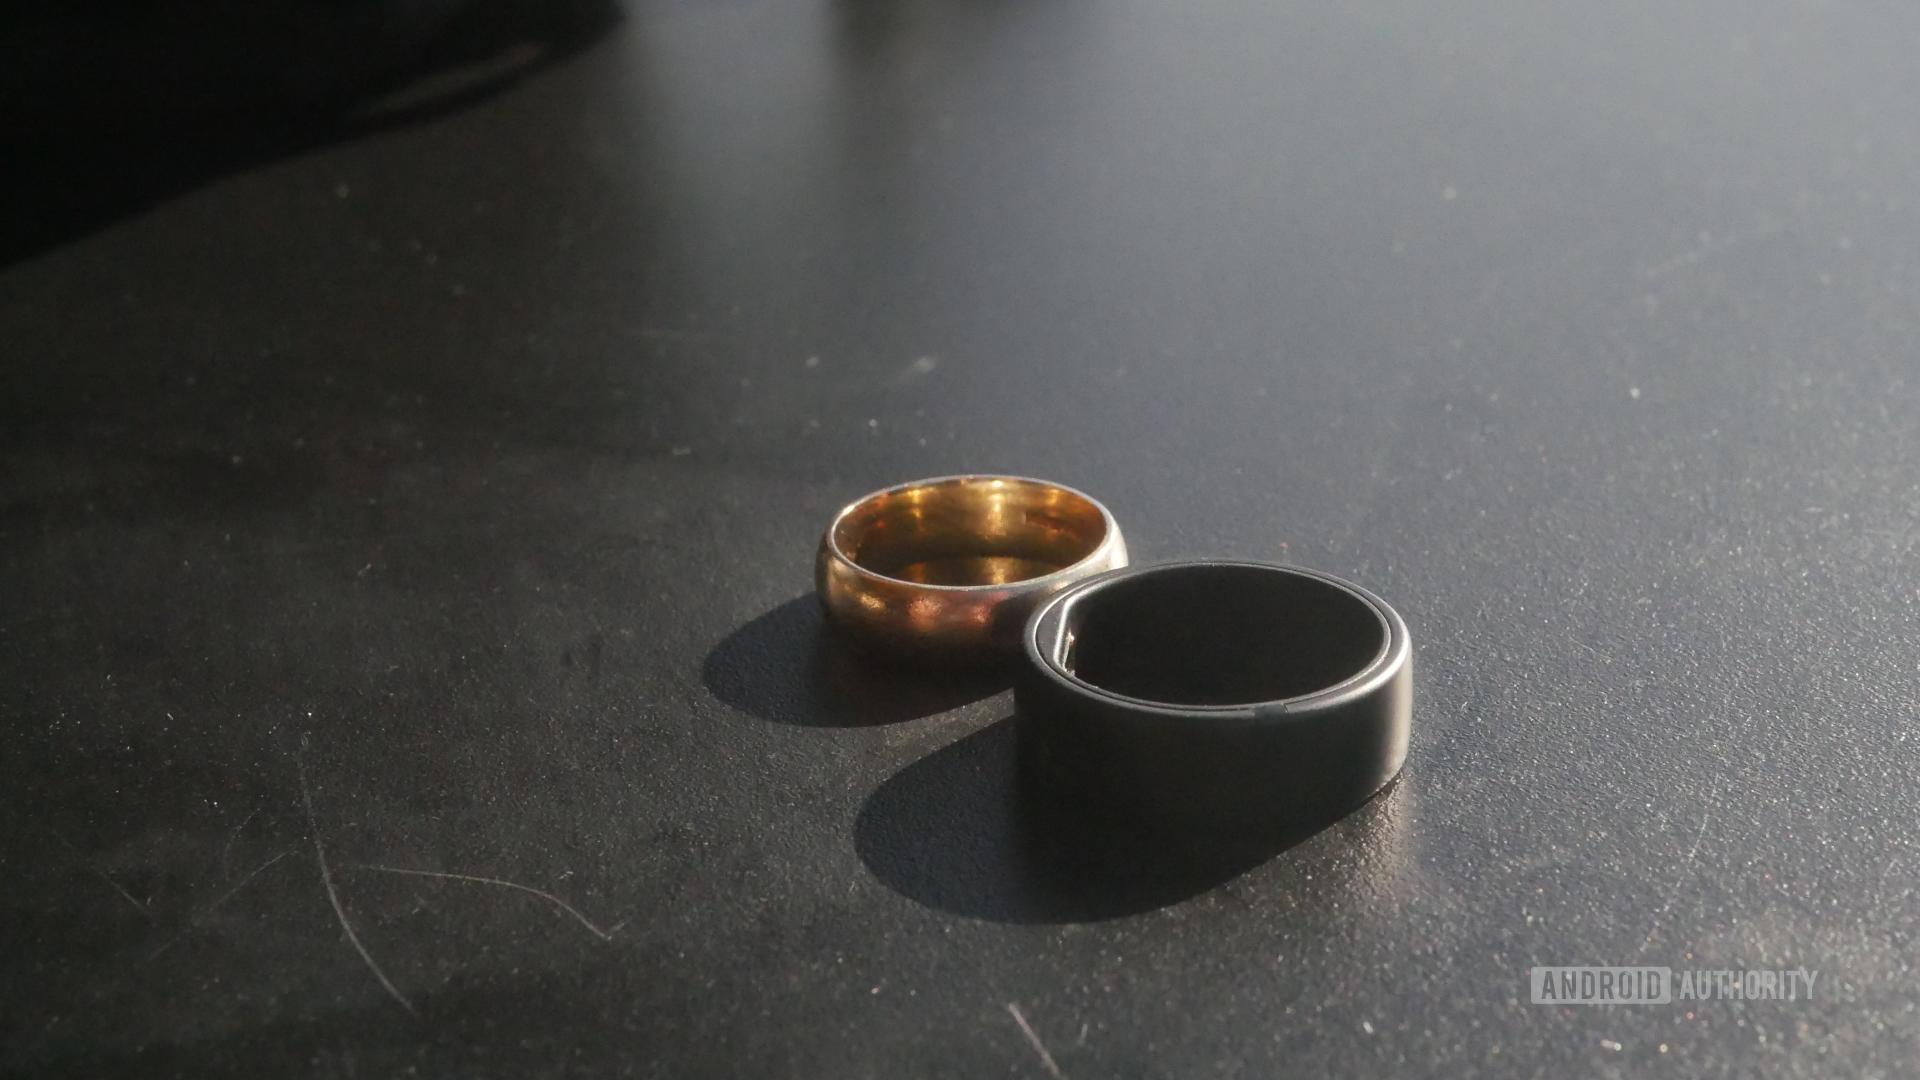 Motiv Ring jewelry comparison, Motiv Ring review